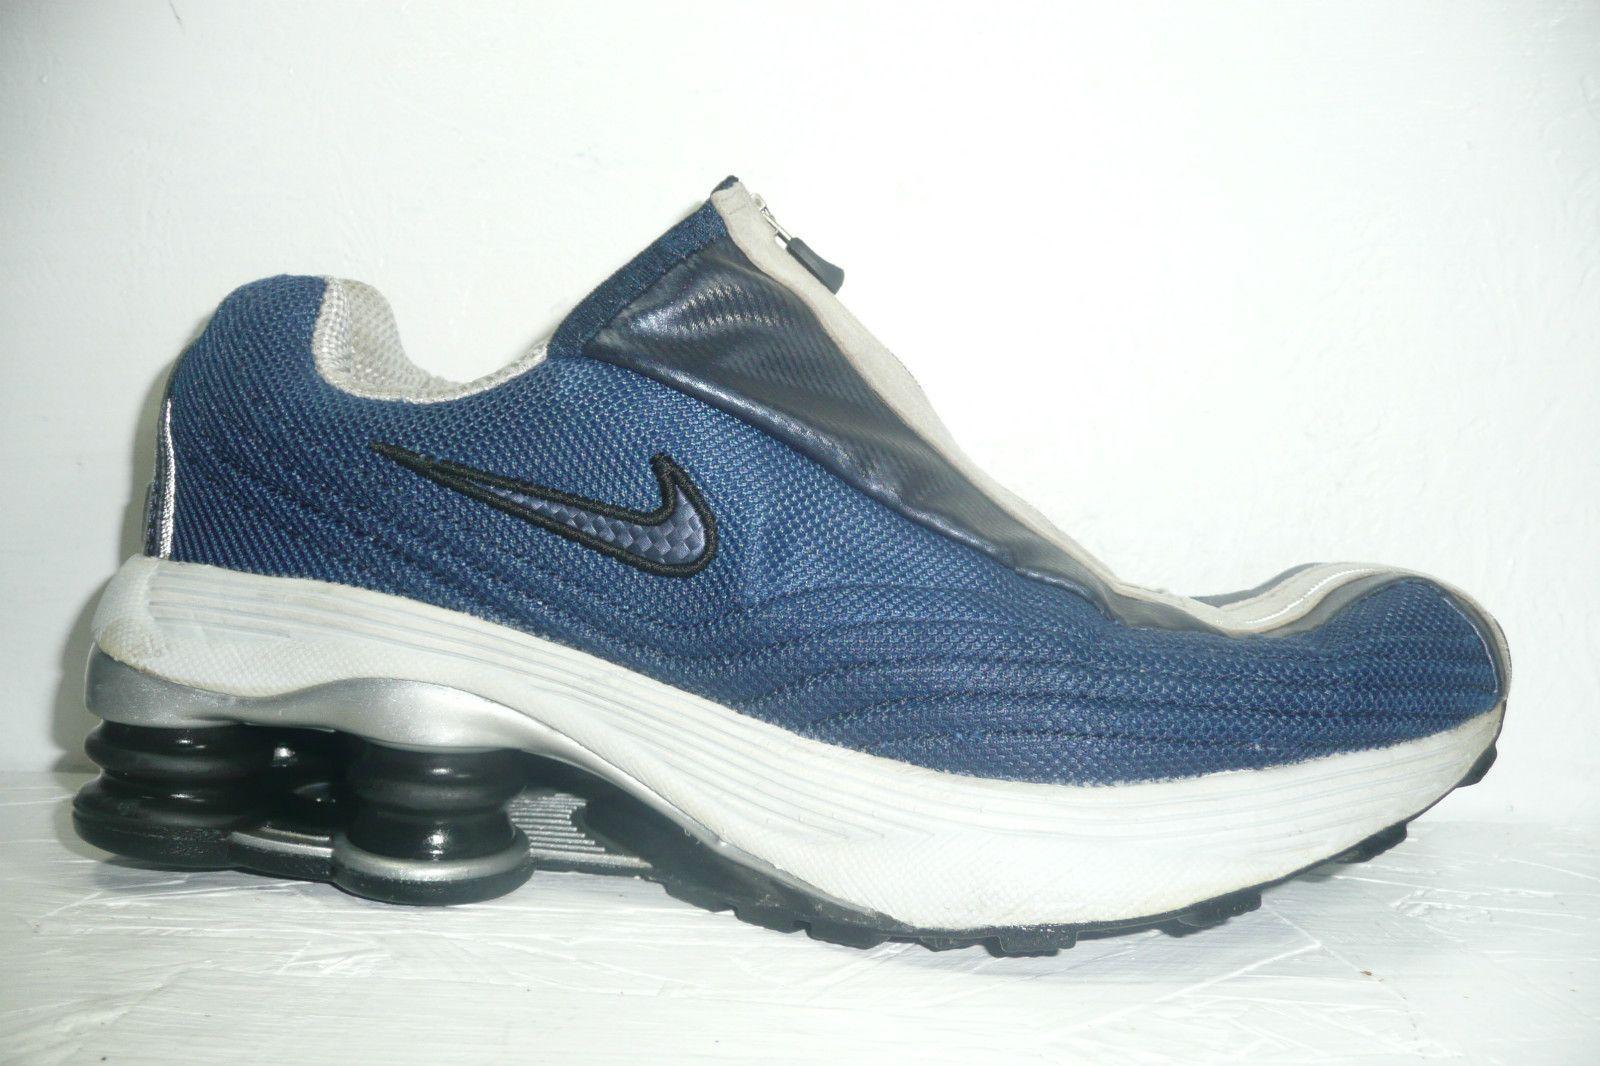 Nike Shox R4 Plus + Silver Red Running Shoes size 11 104311-101 Original  Shox • $54.99